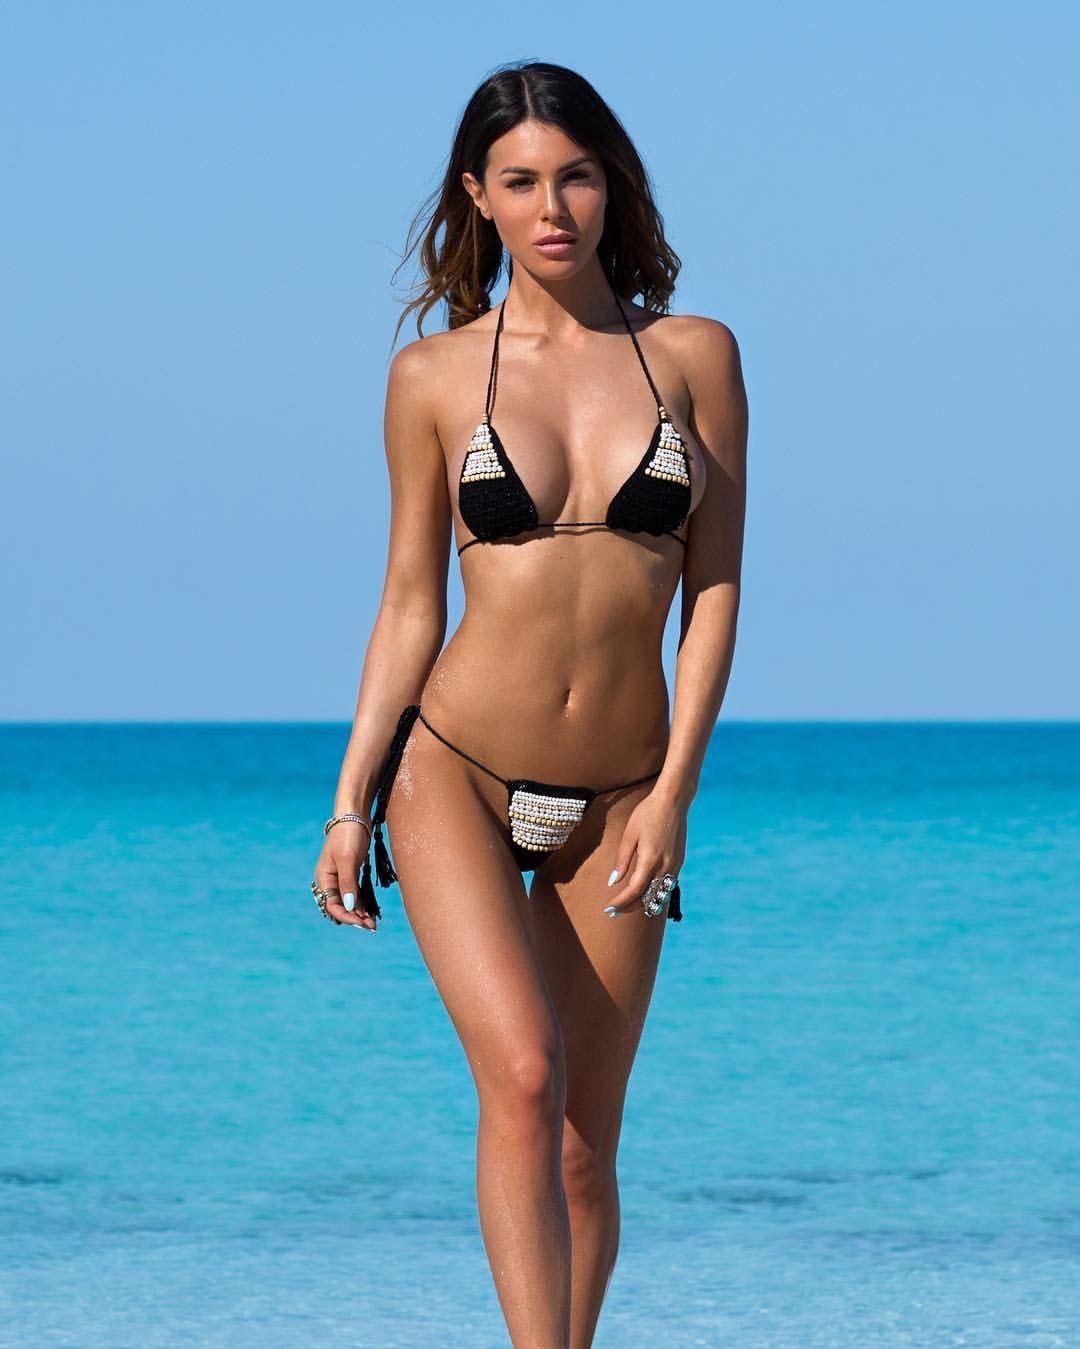 Bikini Silvia Caruso nude (87 photos), Tits, Paparazzi, Selfie, braless 2020